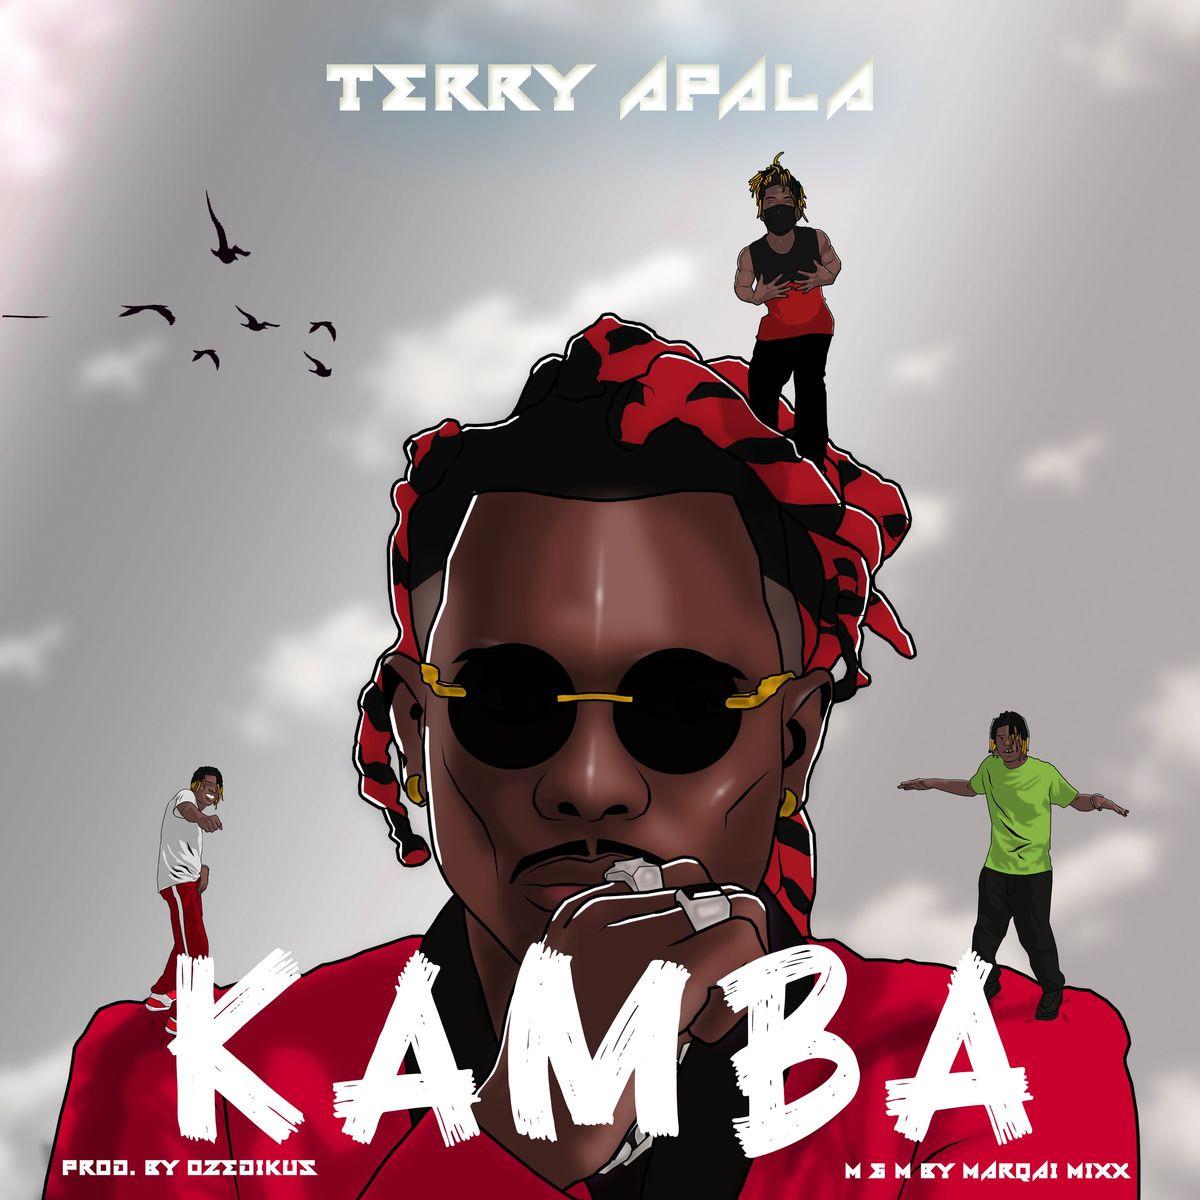 KAMBA CD 1 TRACK 1 128 mp3 image